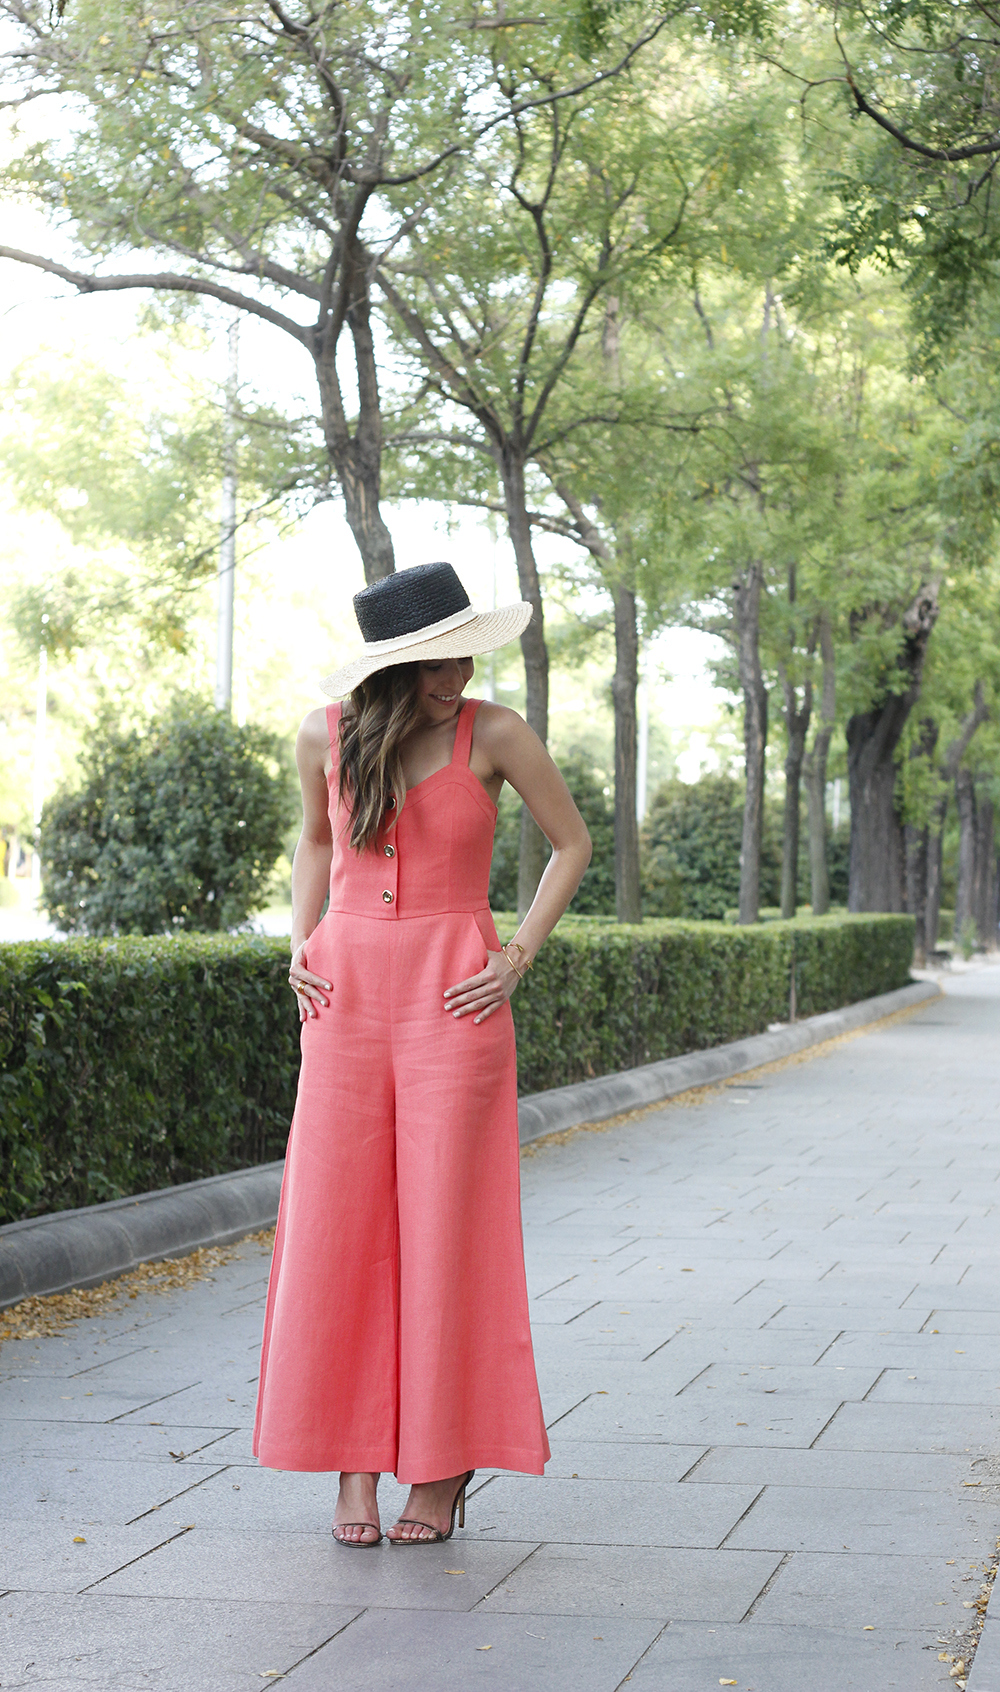 coral jumper uterqüe bronze heels accessories earrings summer outfit05